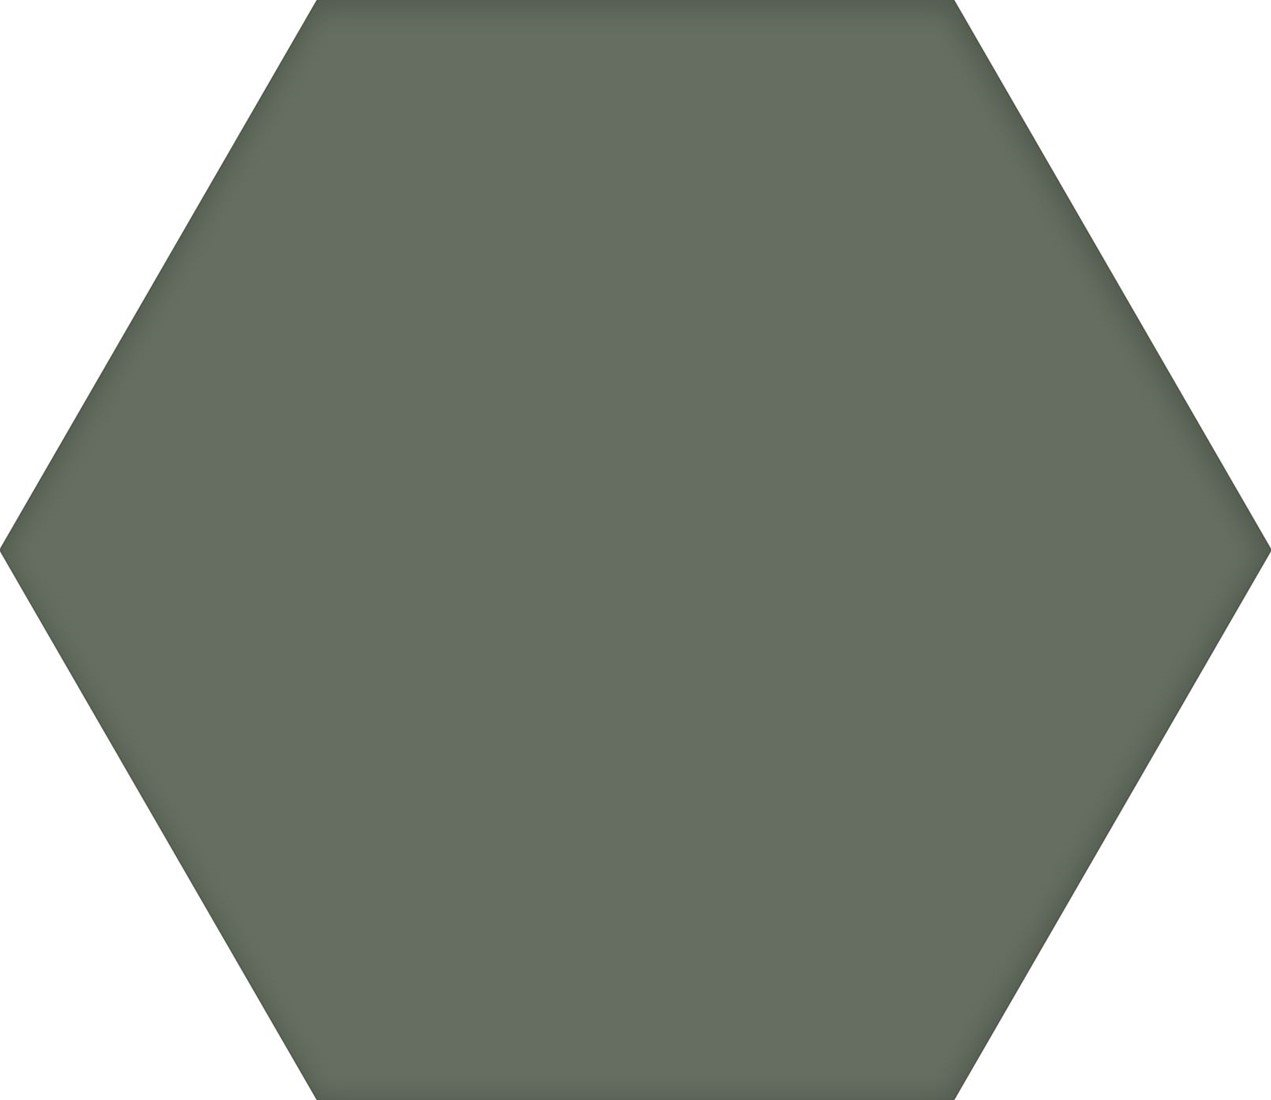 Codicer Hex25 Basic hexagon vloertegel 25x22 Moss